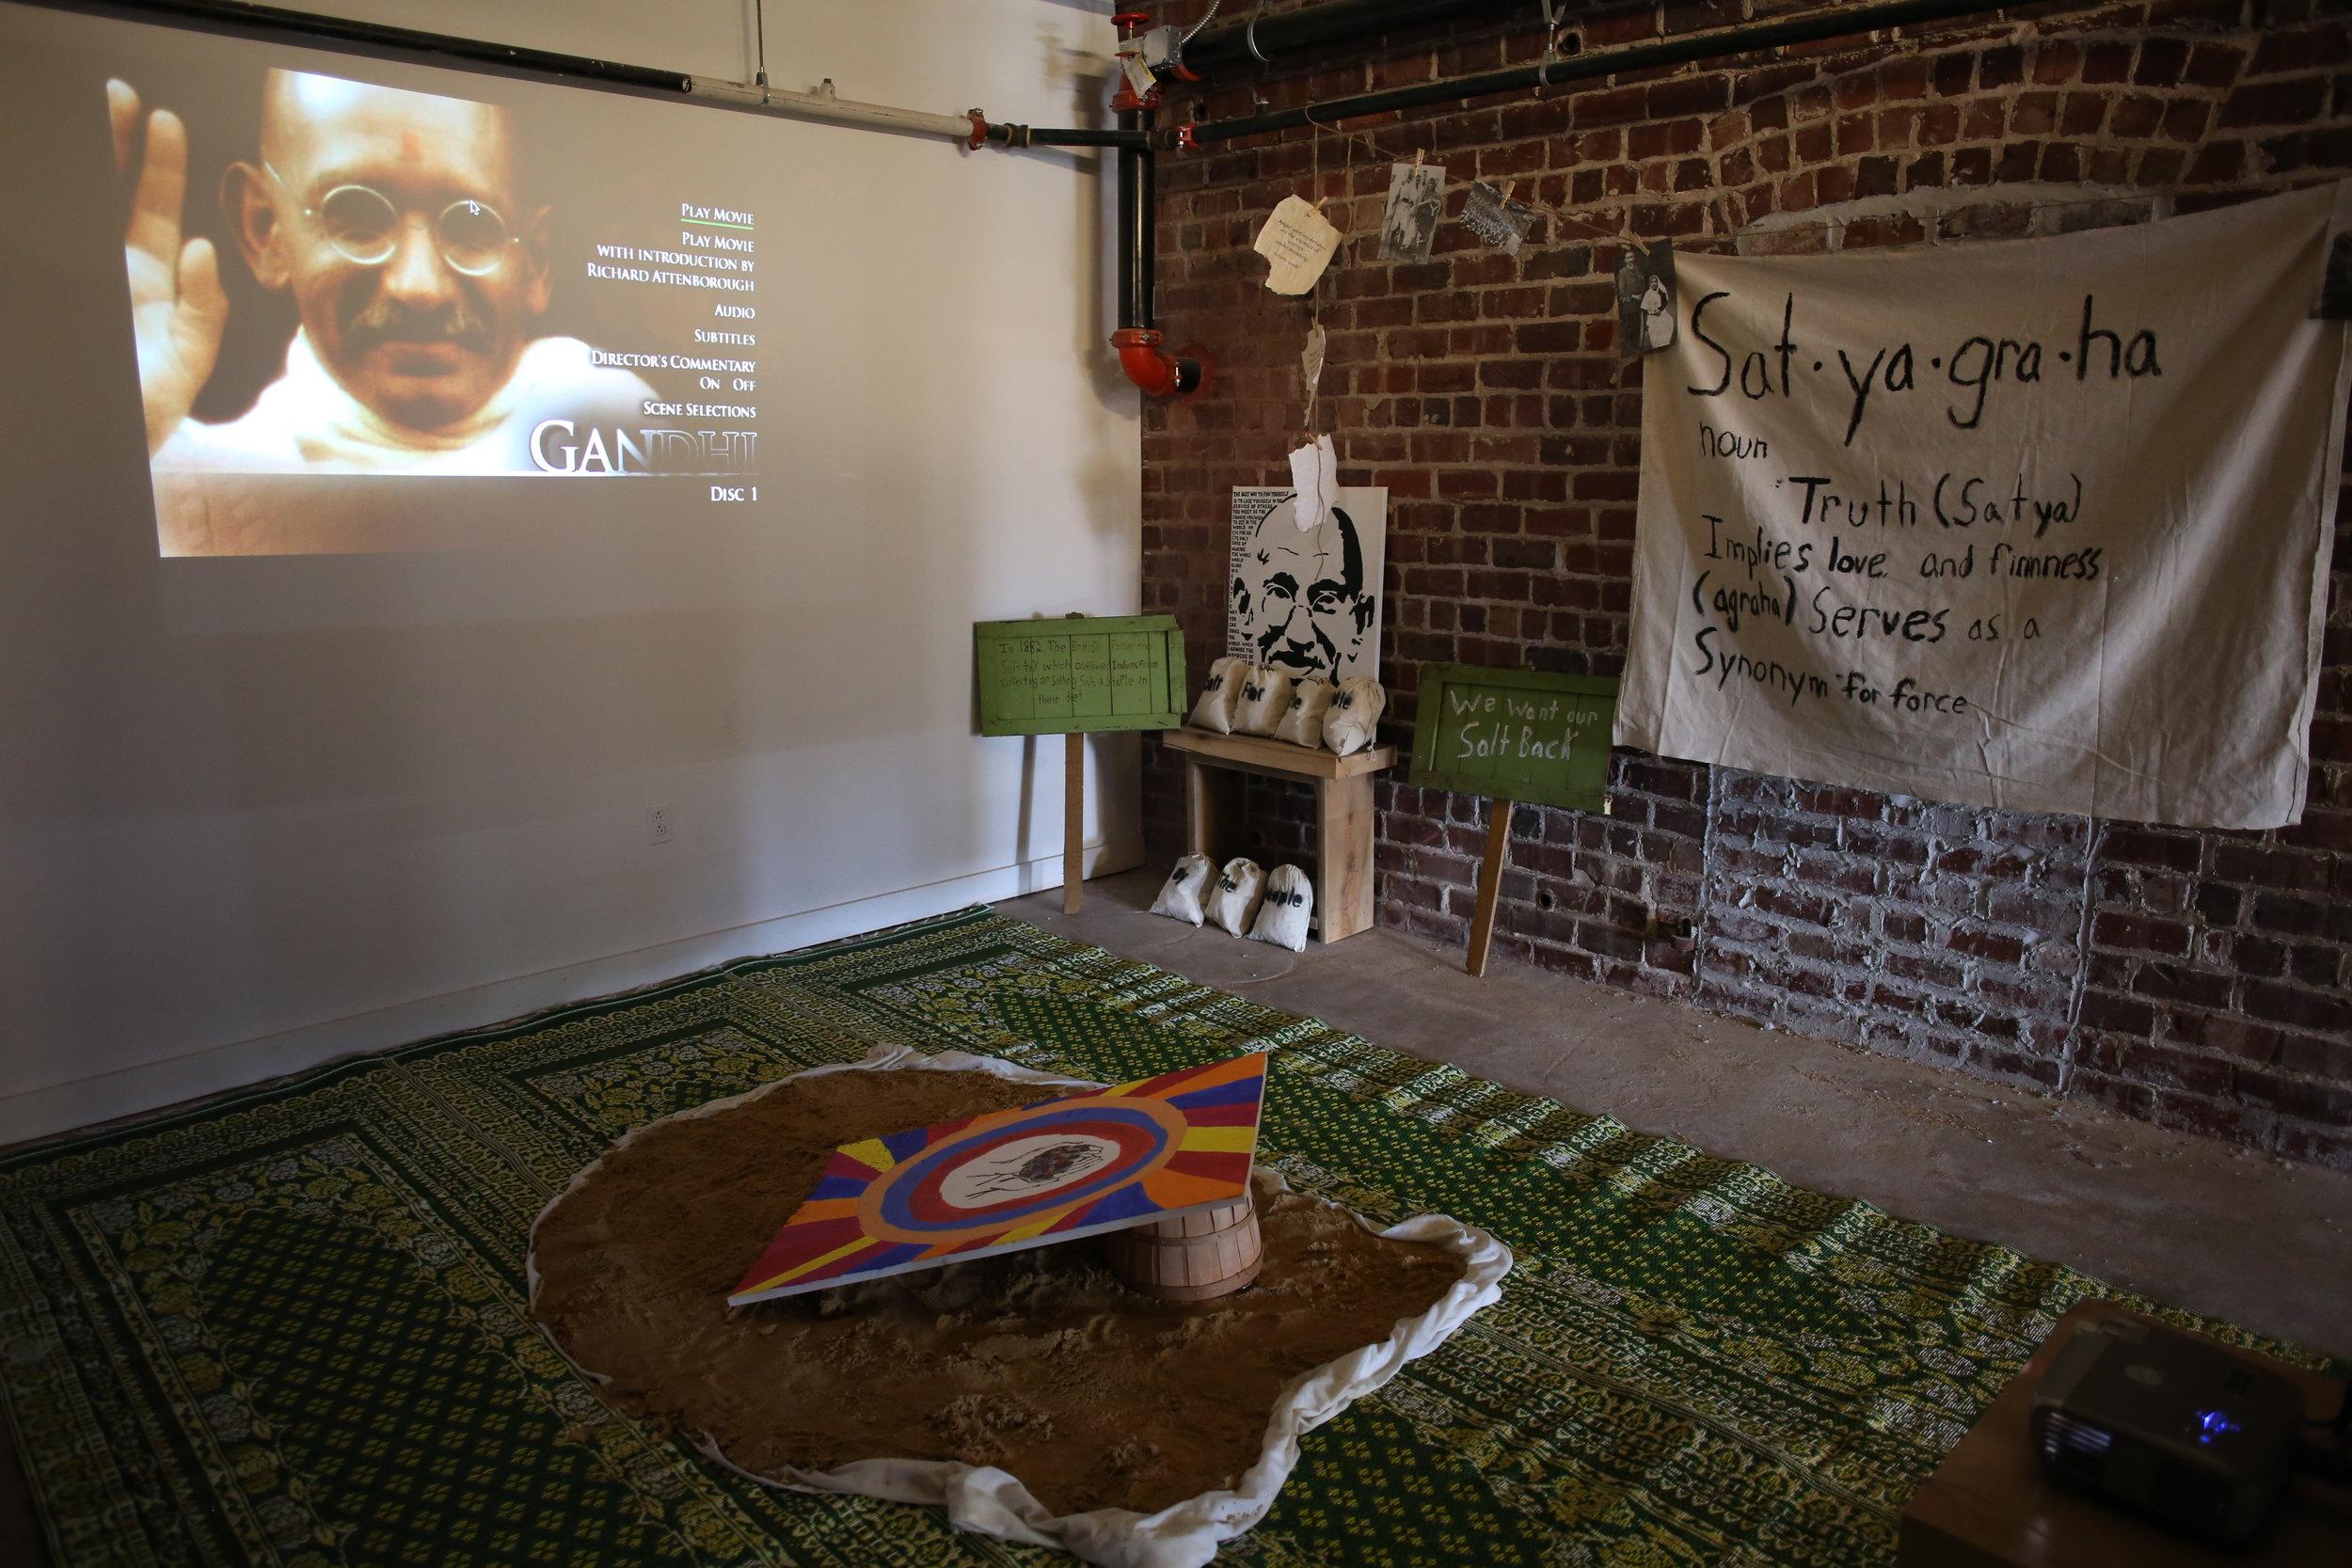 Gandhi exhibit at Celebrations of Learning 2018.